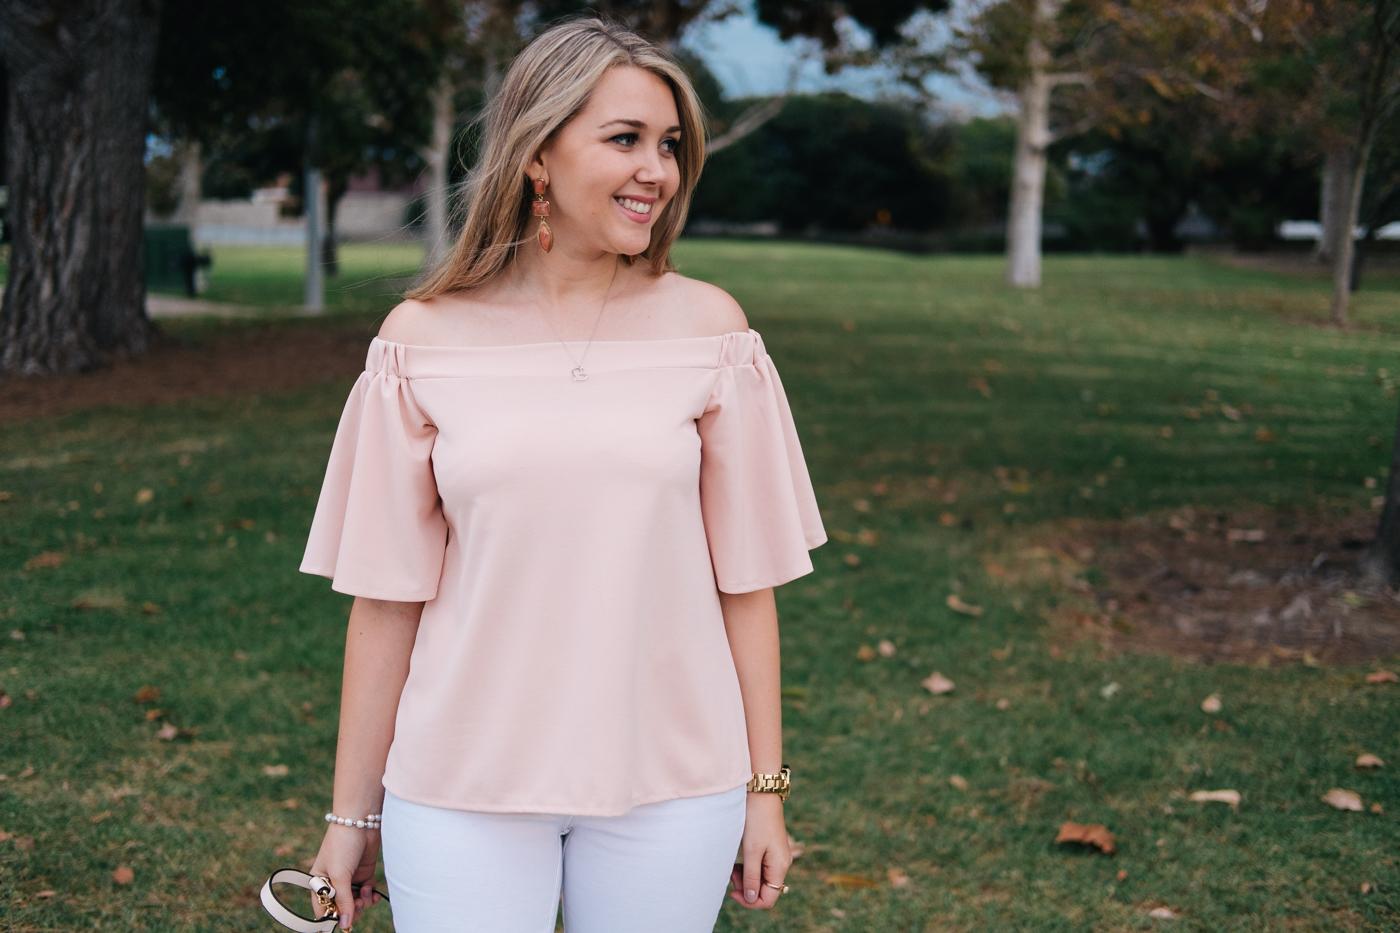 Debora Dahl wearing a pink off the shoulder white blouse from dresslily